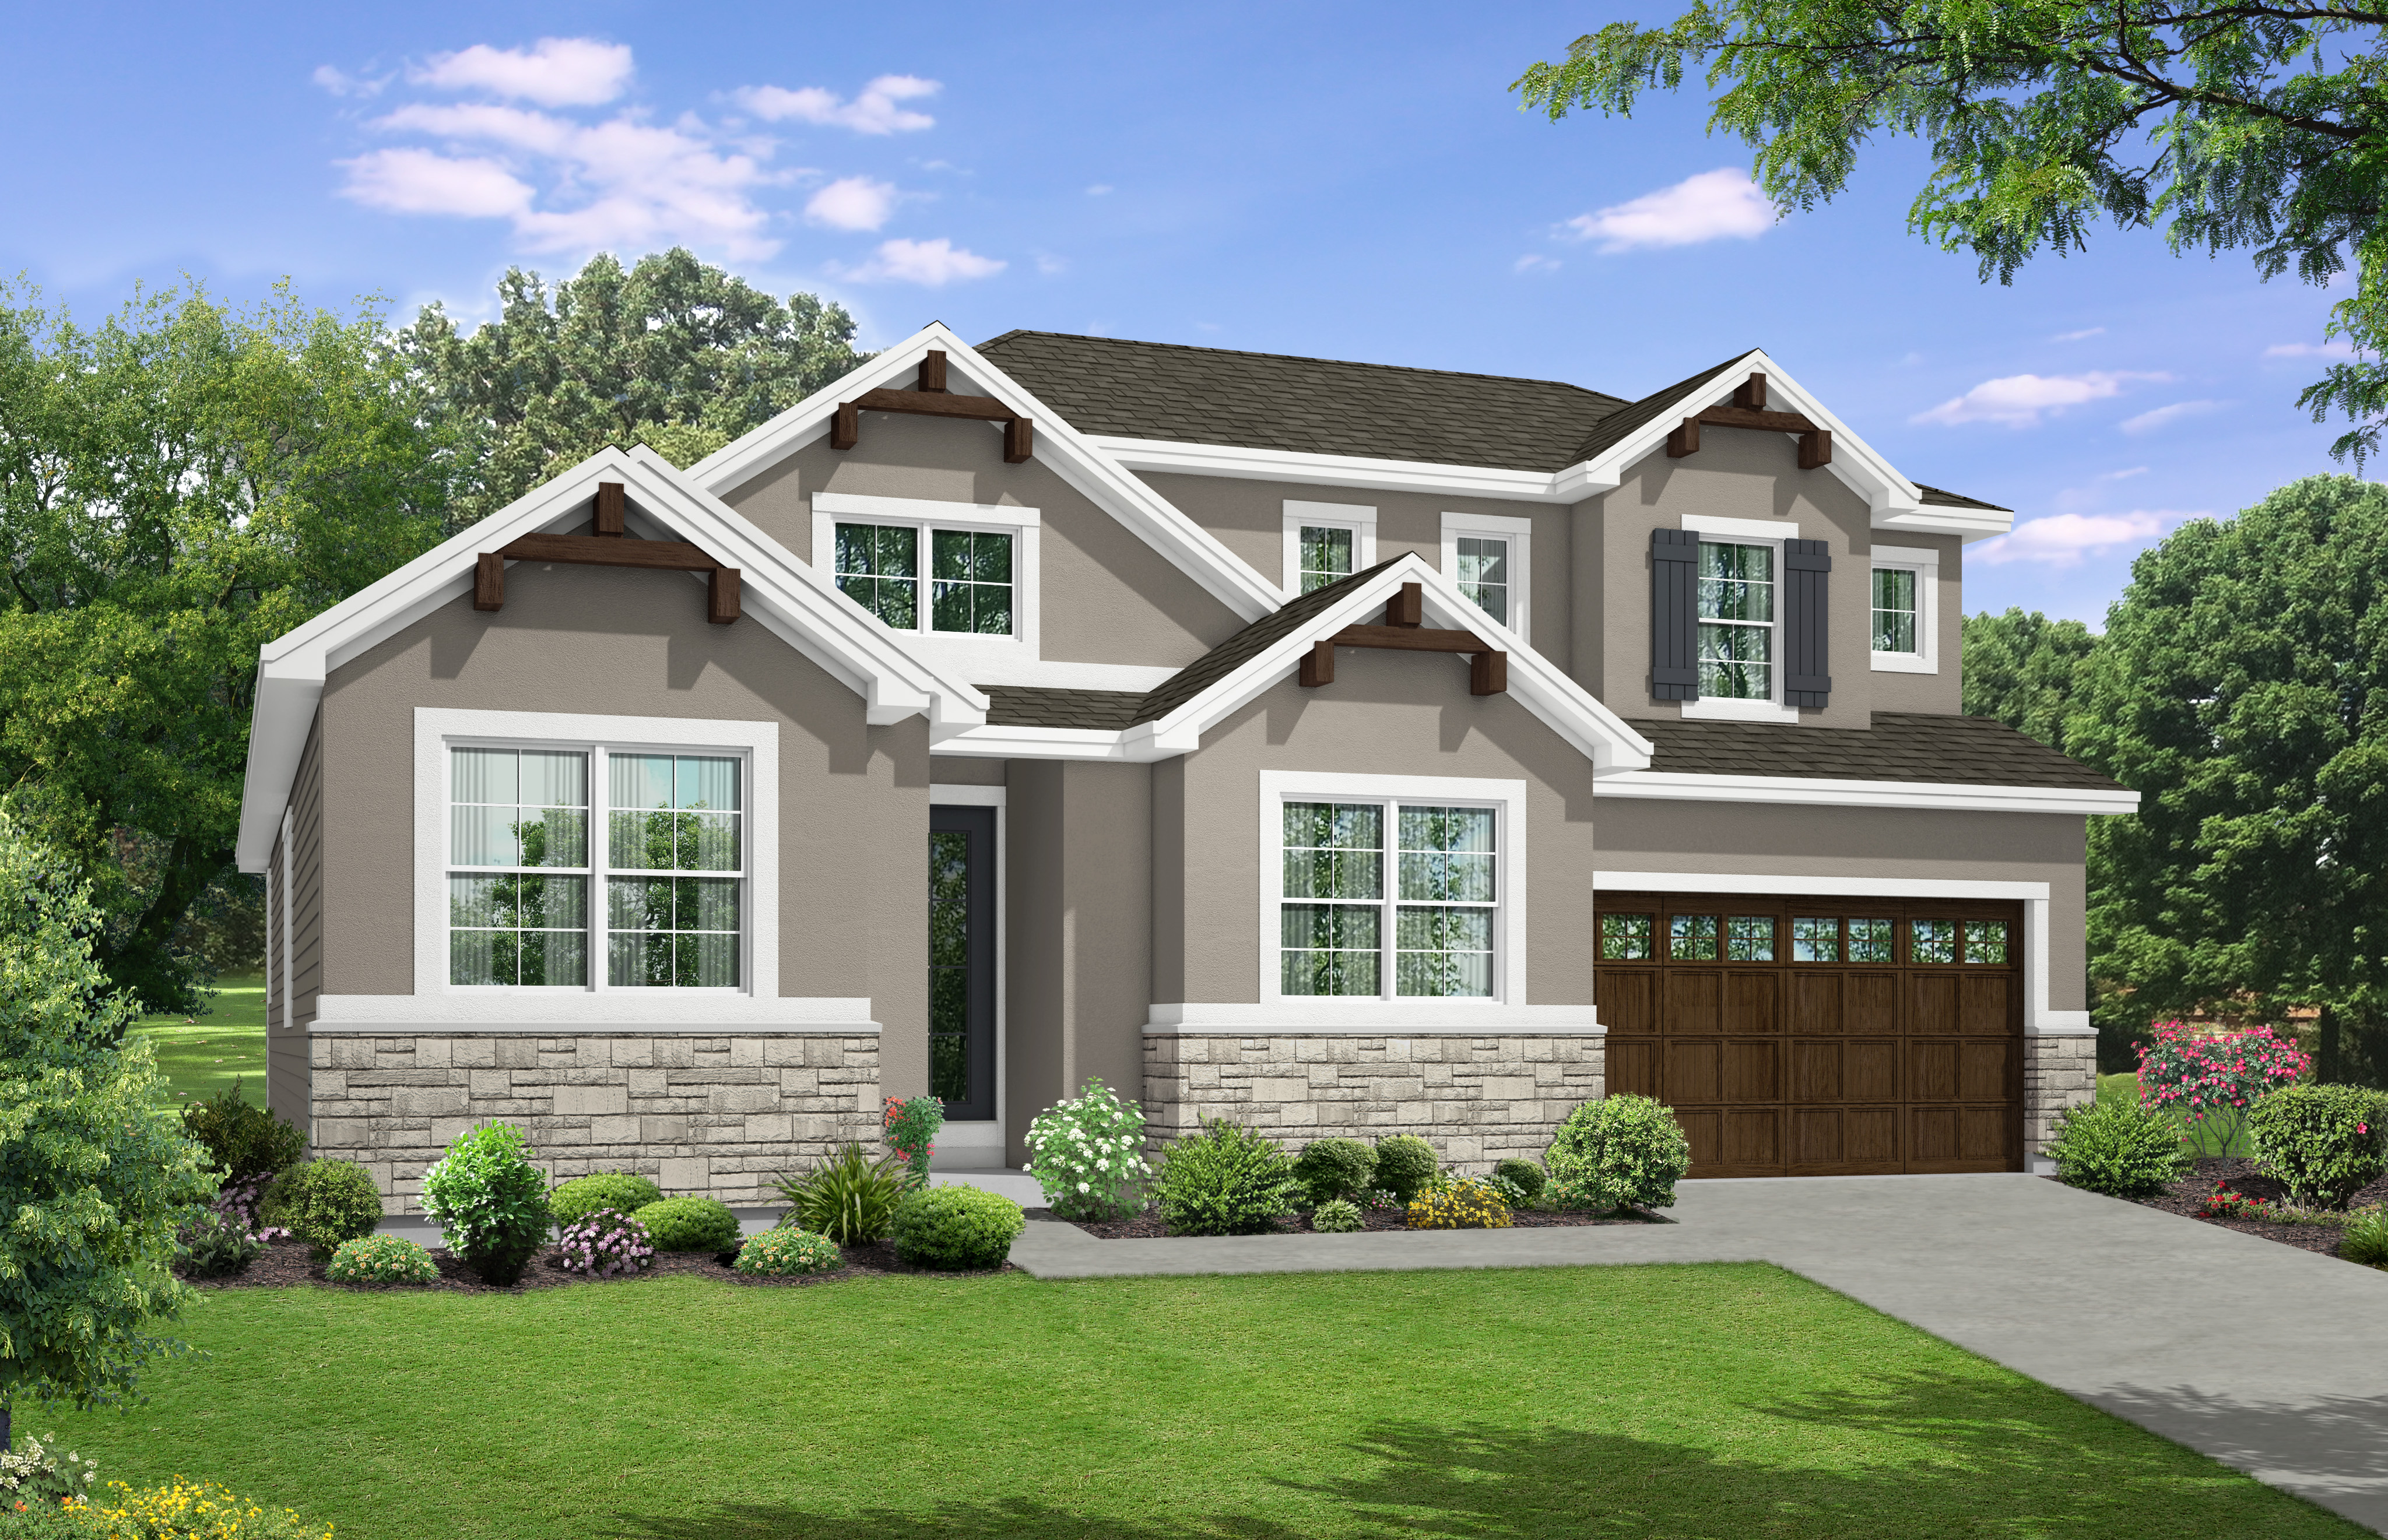 Lc_homes-the_ridge_at_mariana_butte_palmer_a_sch_5_01